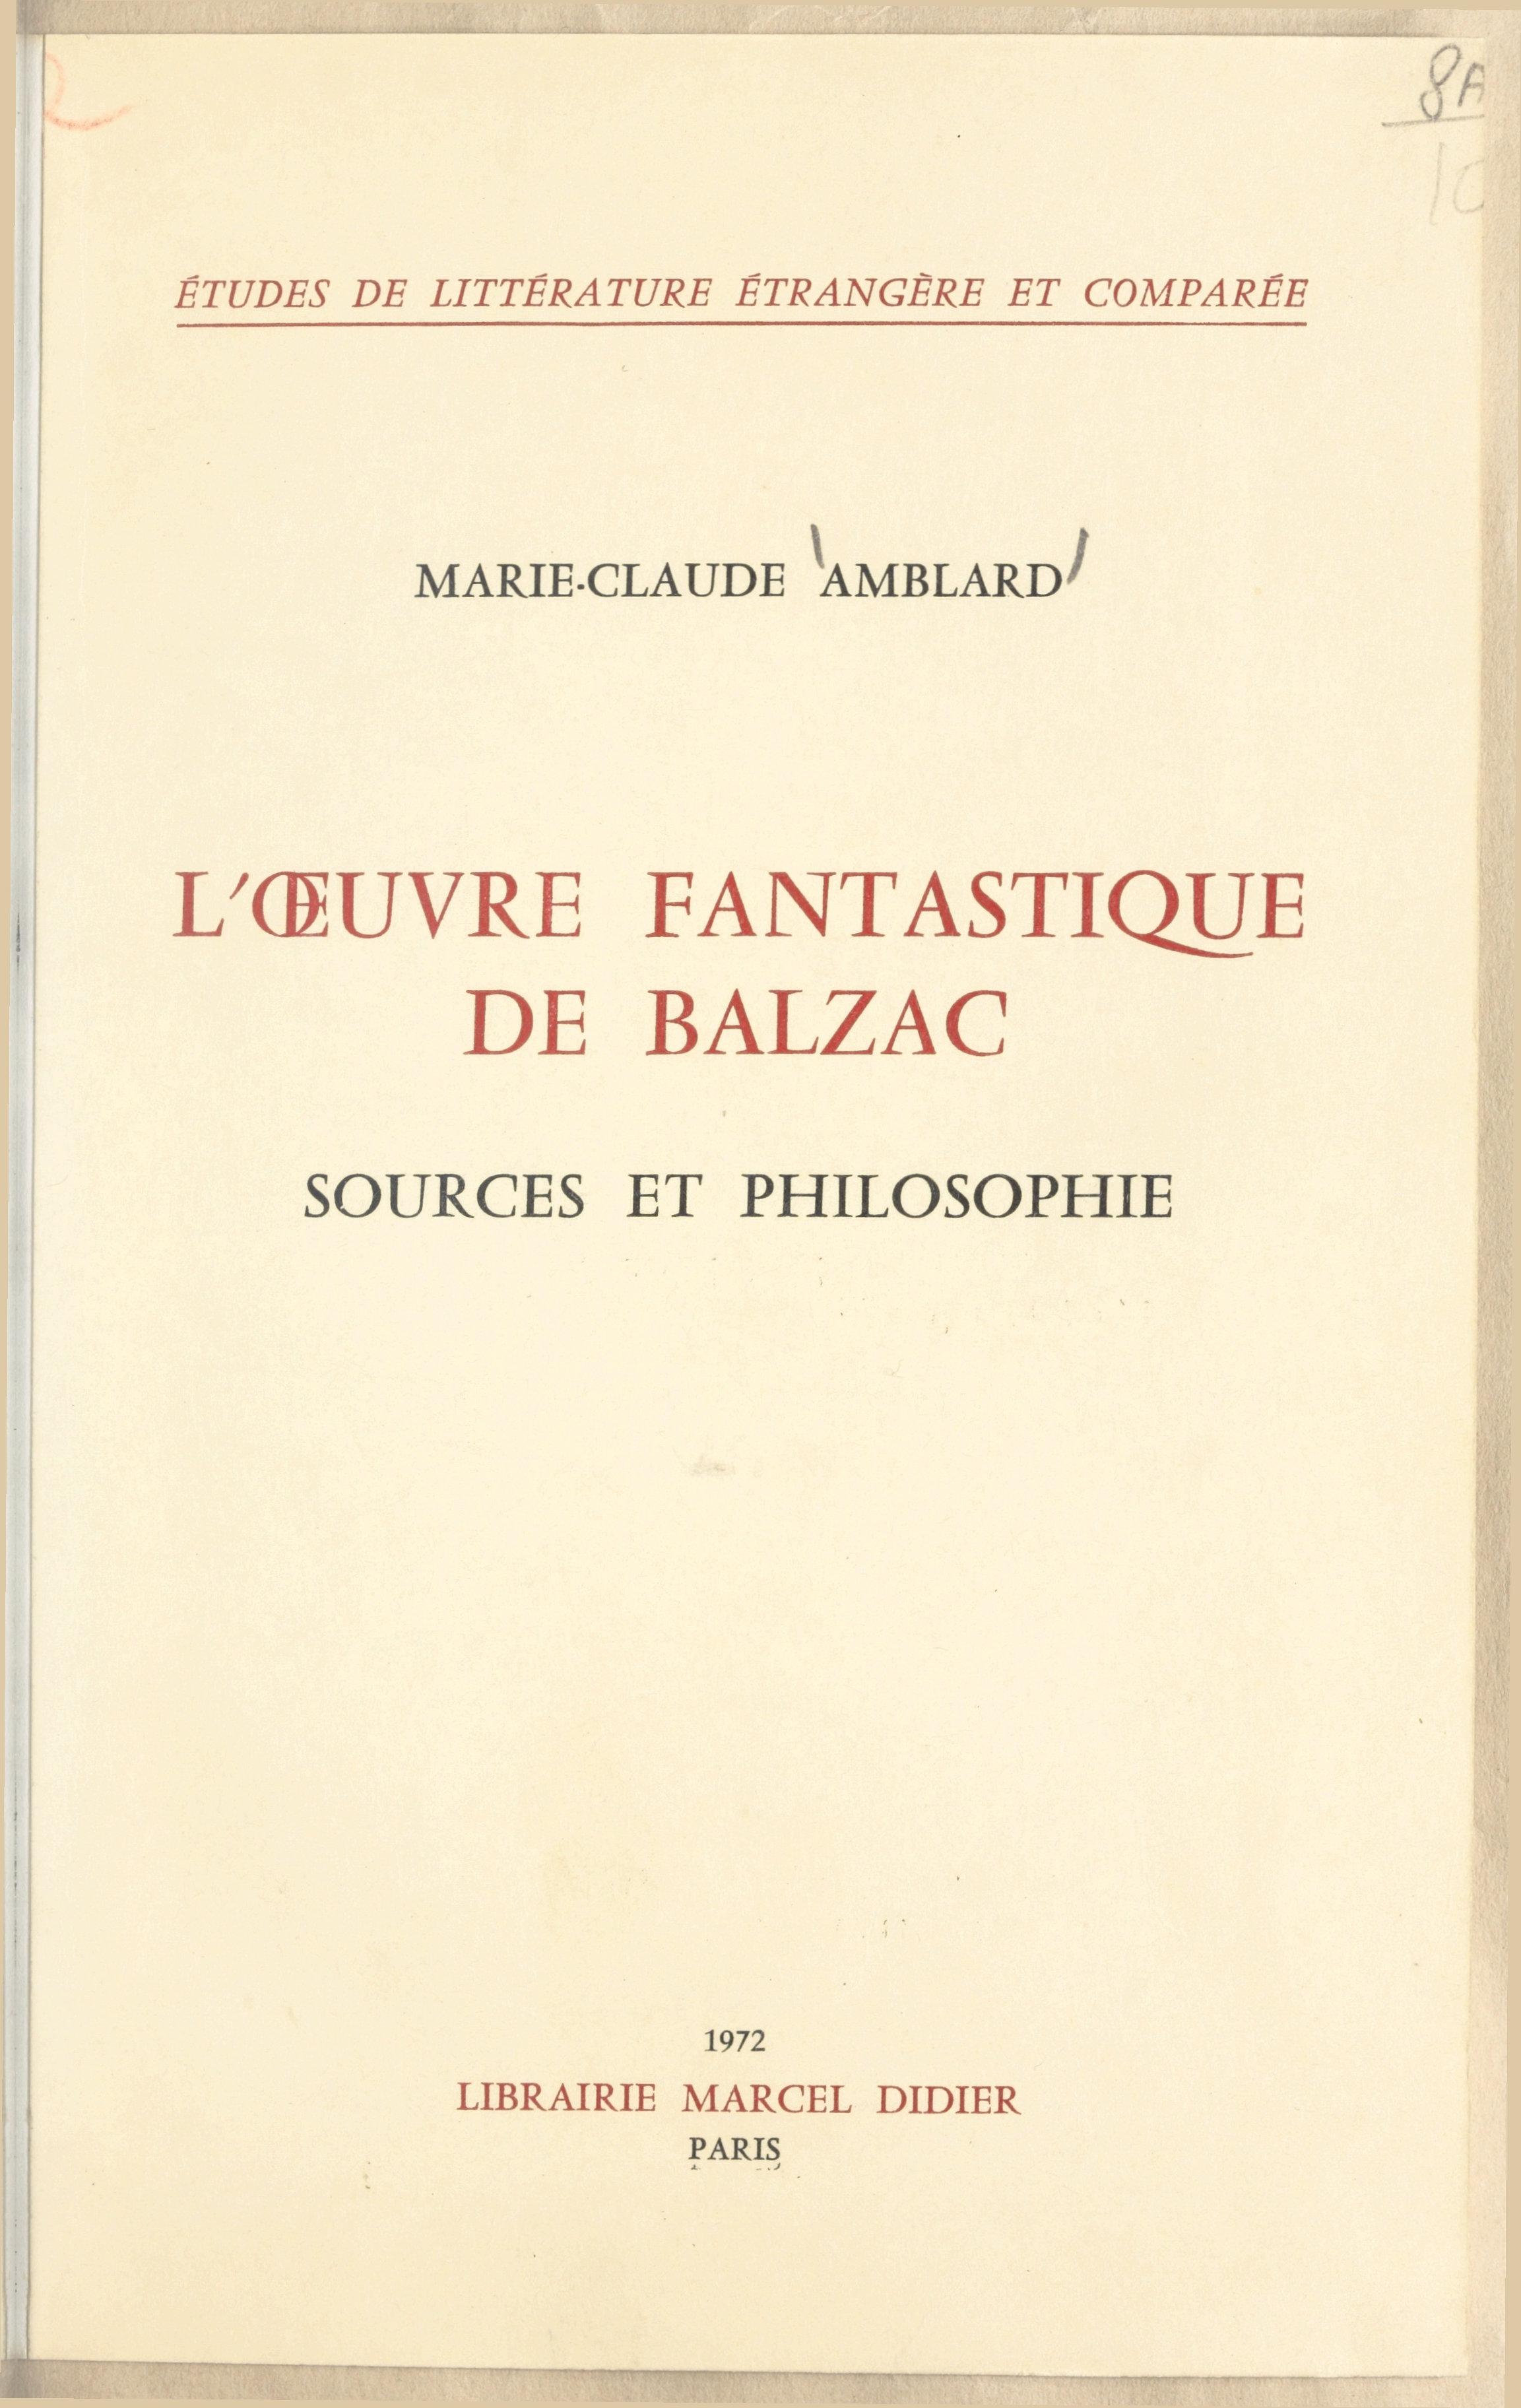 L'œuvre fantastique de Balzac